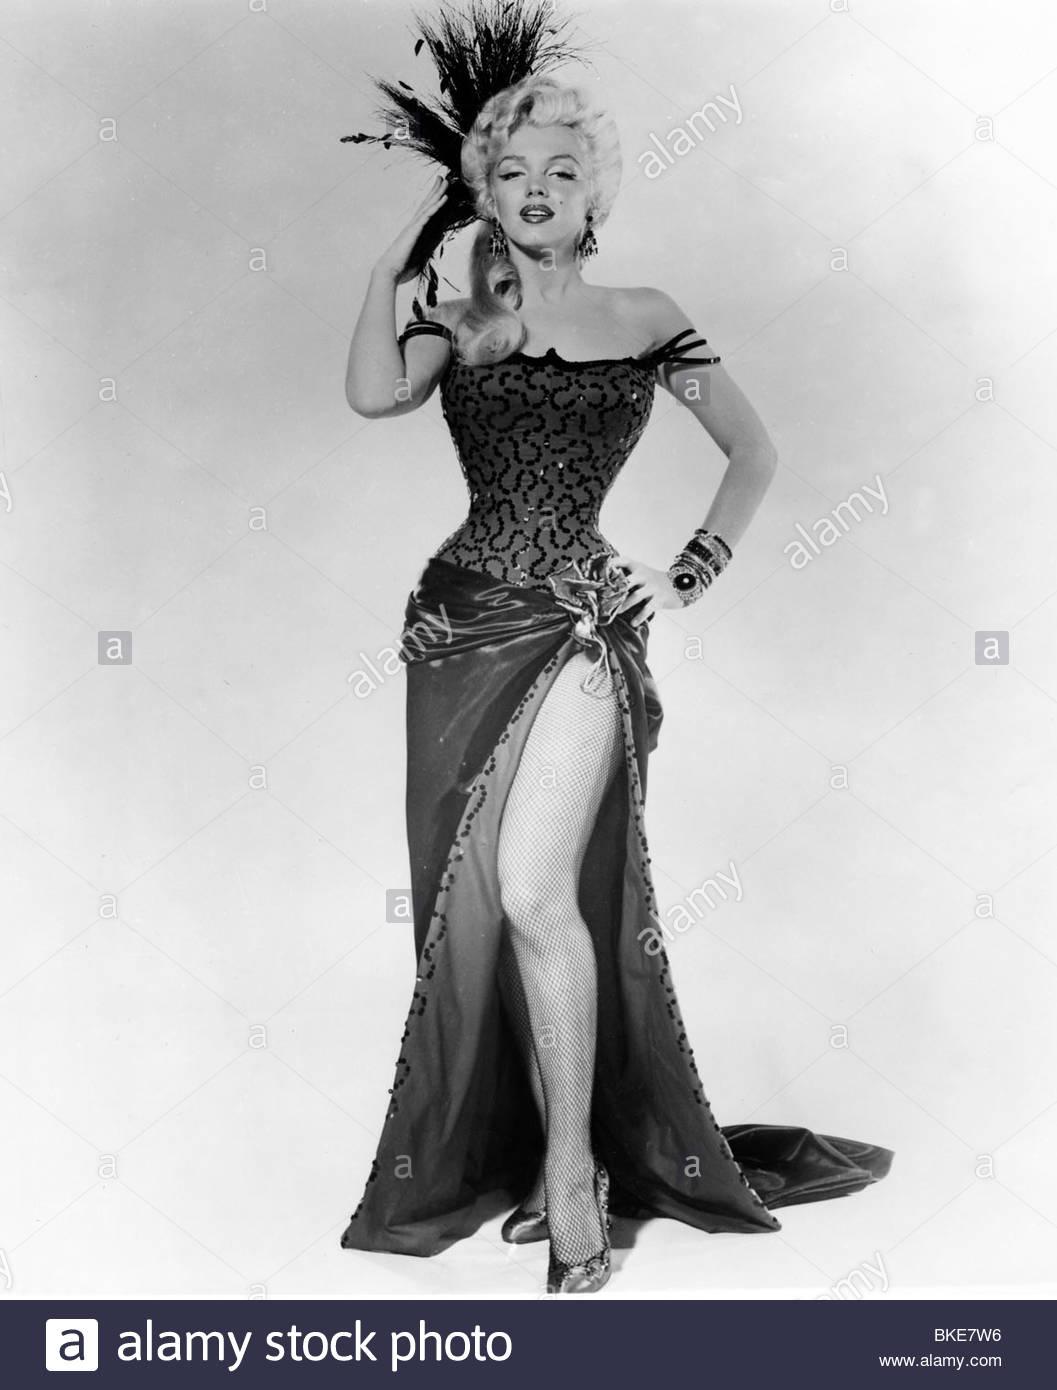 Marilyn monroe ornaments - Stock Photo Movie River Of No Return Usa 1954 Director Otto Preminger Pr Photo With Marilyn Monroe Cinema Adventure Western Full